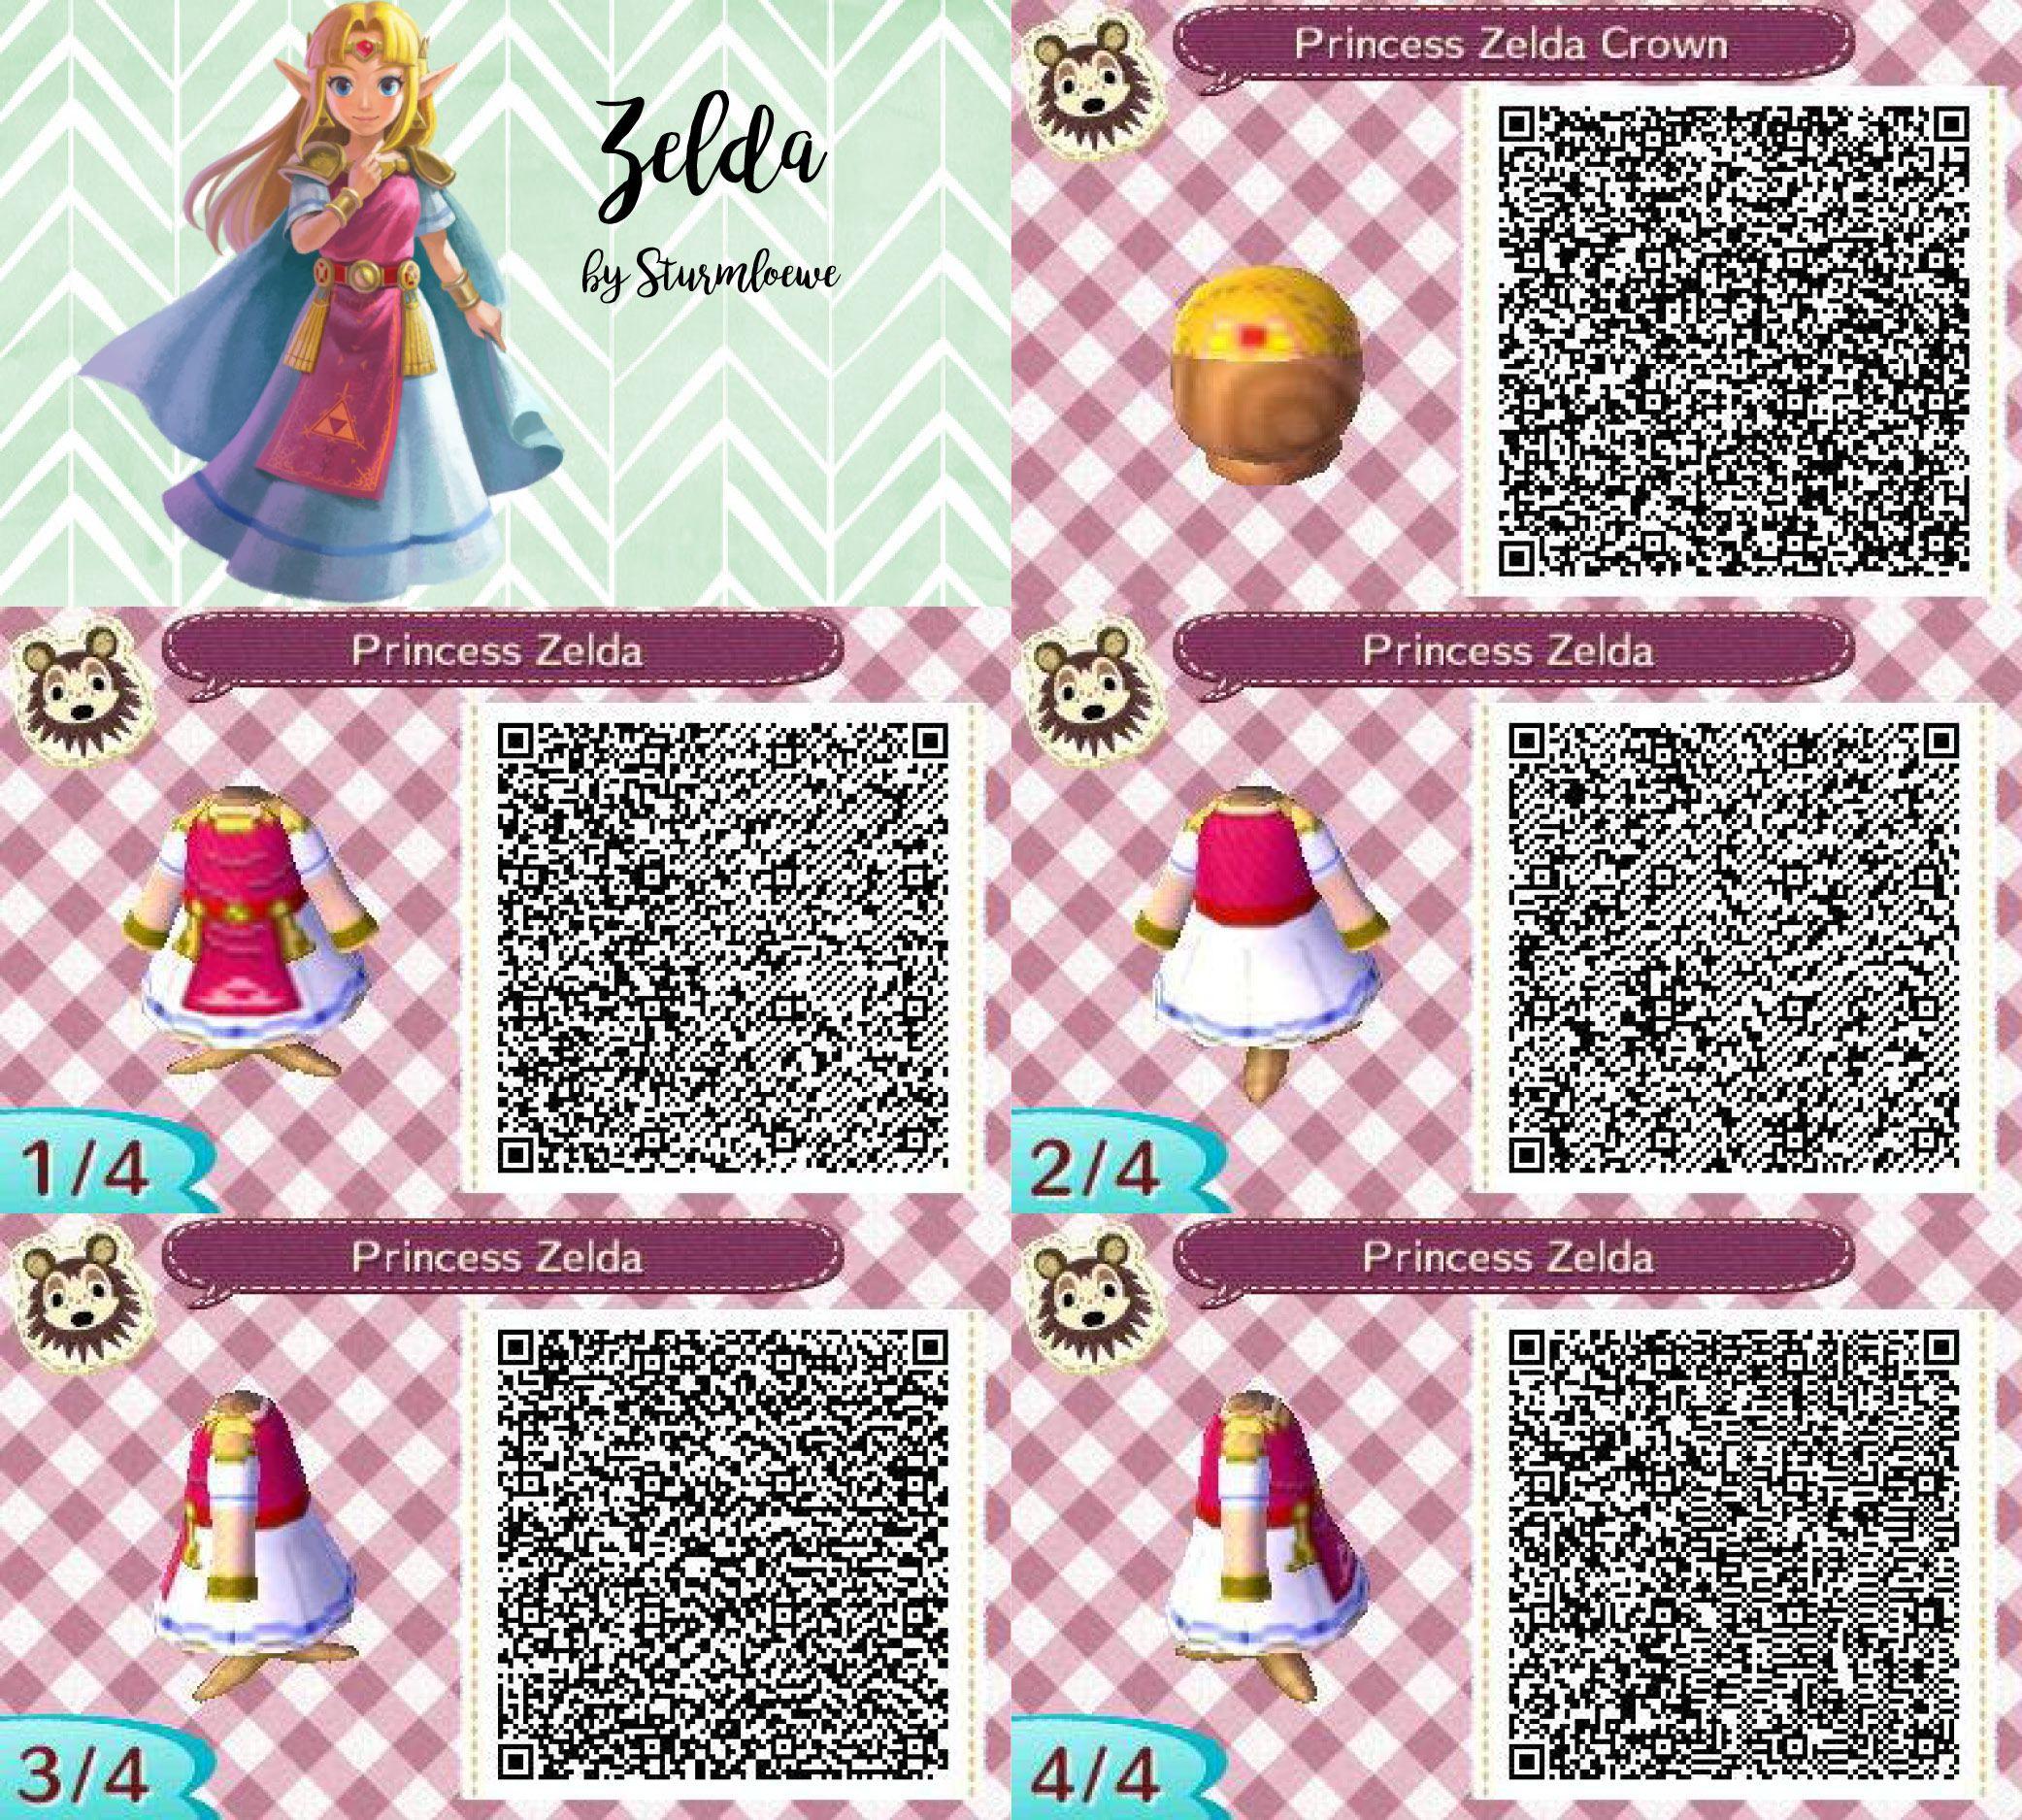 Animal Crossing New Leaf Qr Code The Legend Of Zelda A Link Between Worlds Princess Zelda Of Hyr Animal Crossing Hair Animal Crossing Game Animal Crossing 3ds